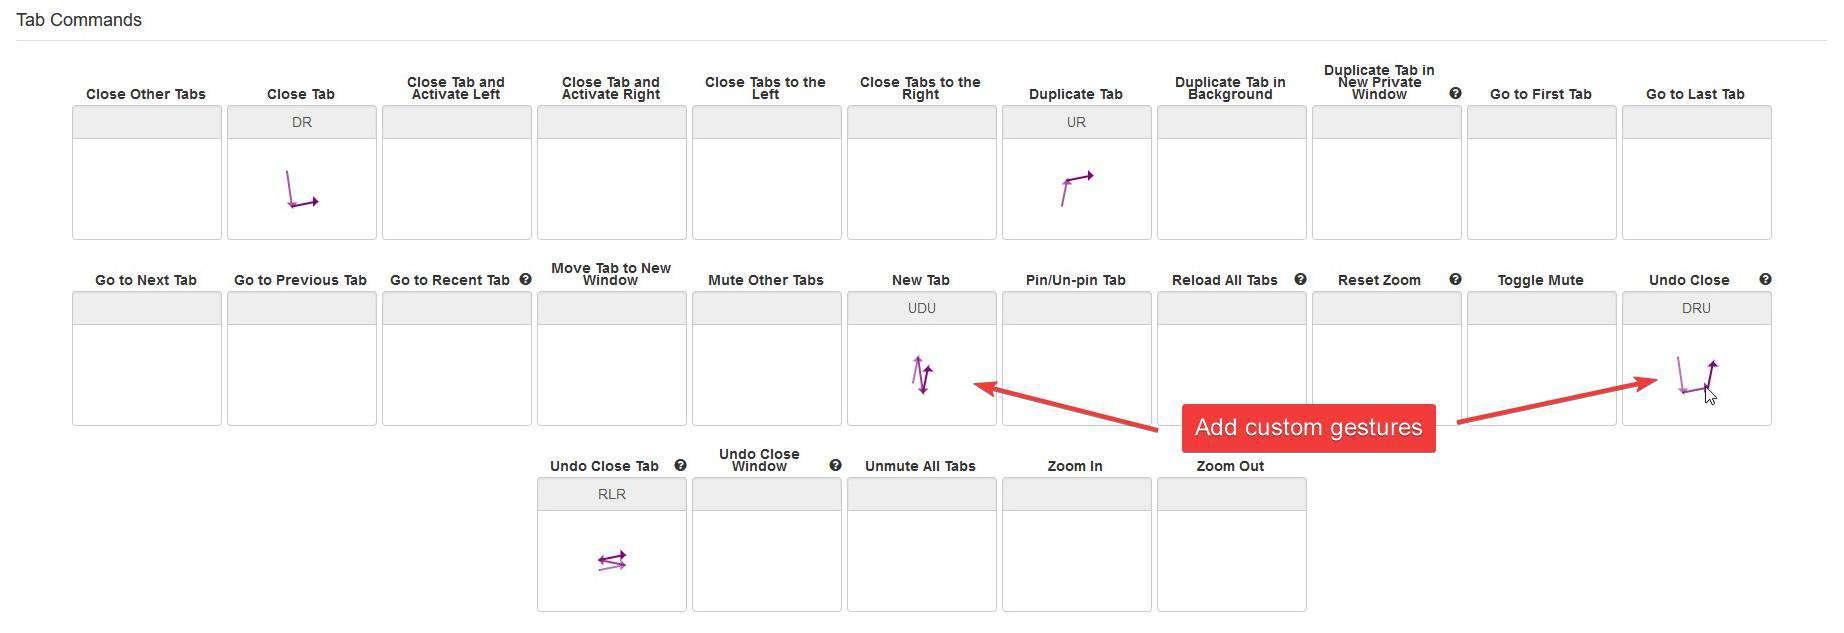 Foxy Gestures custom shortcuts